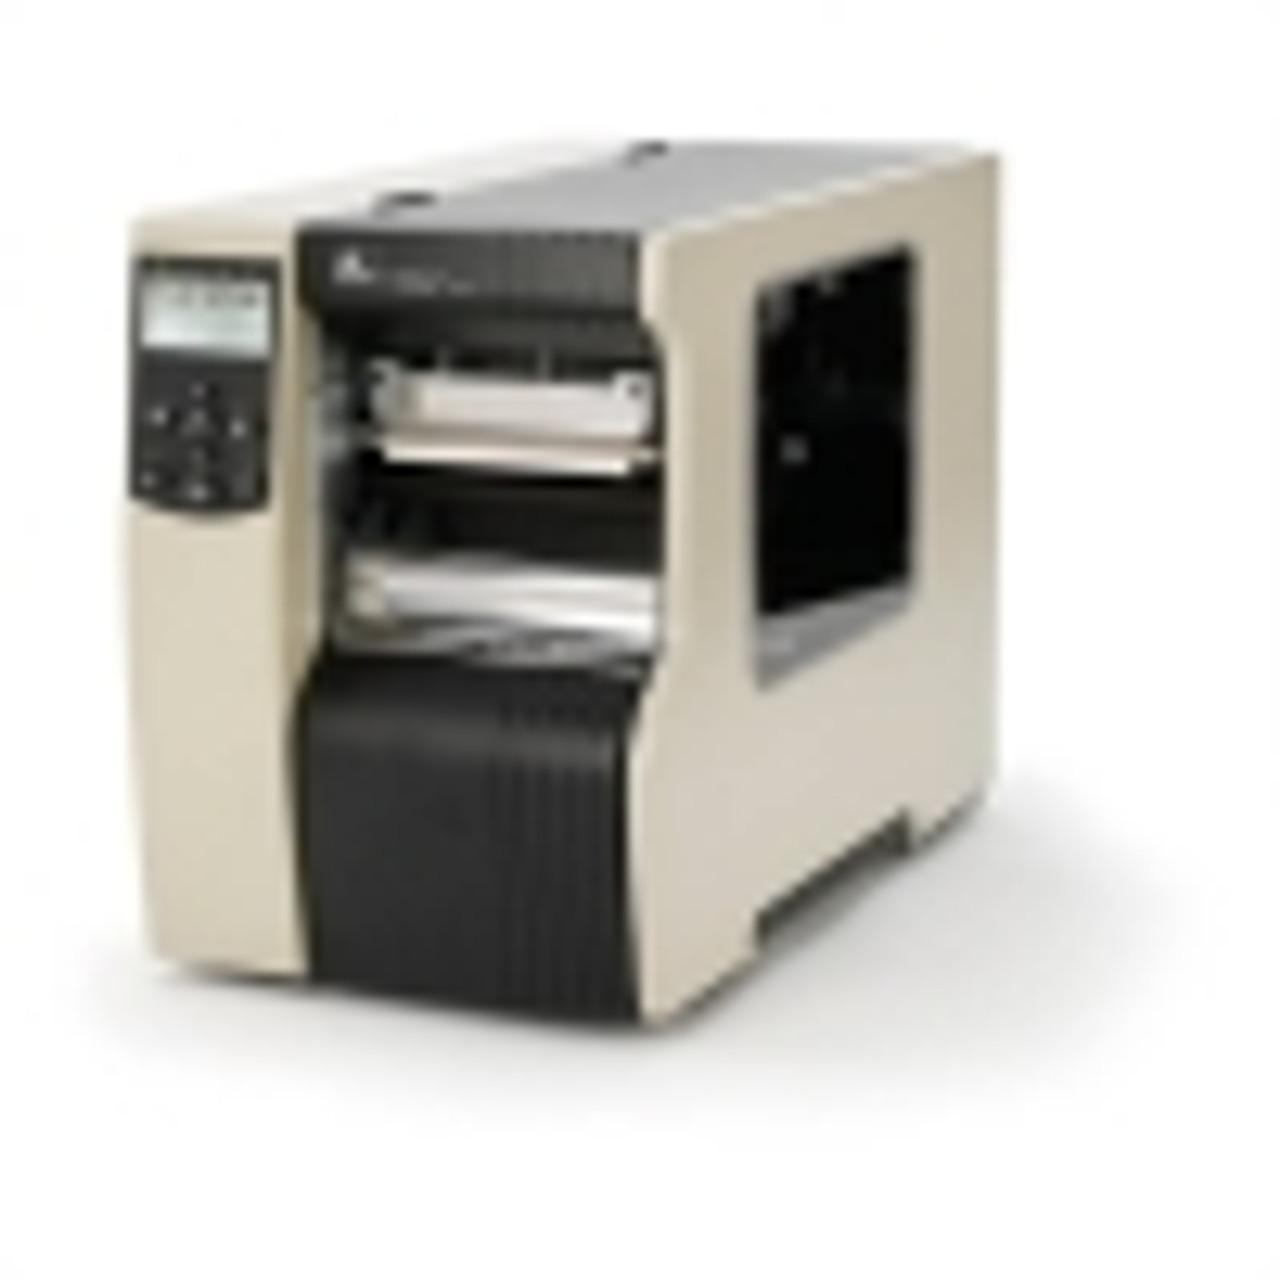 140xi4 Printers